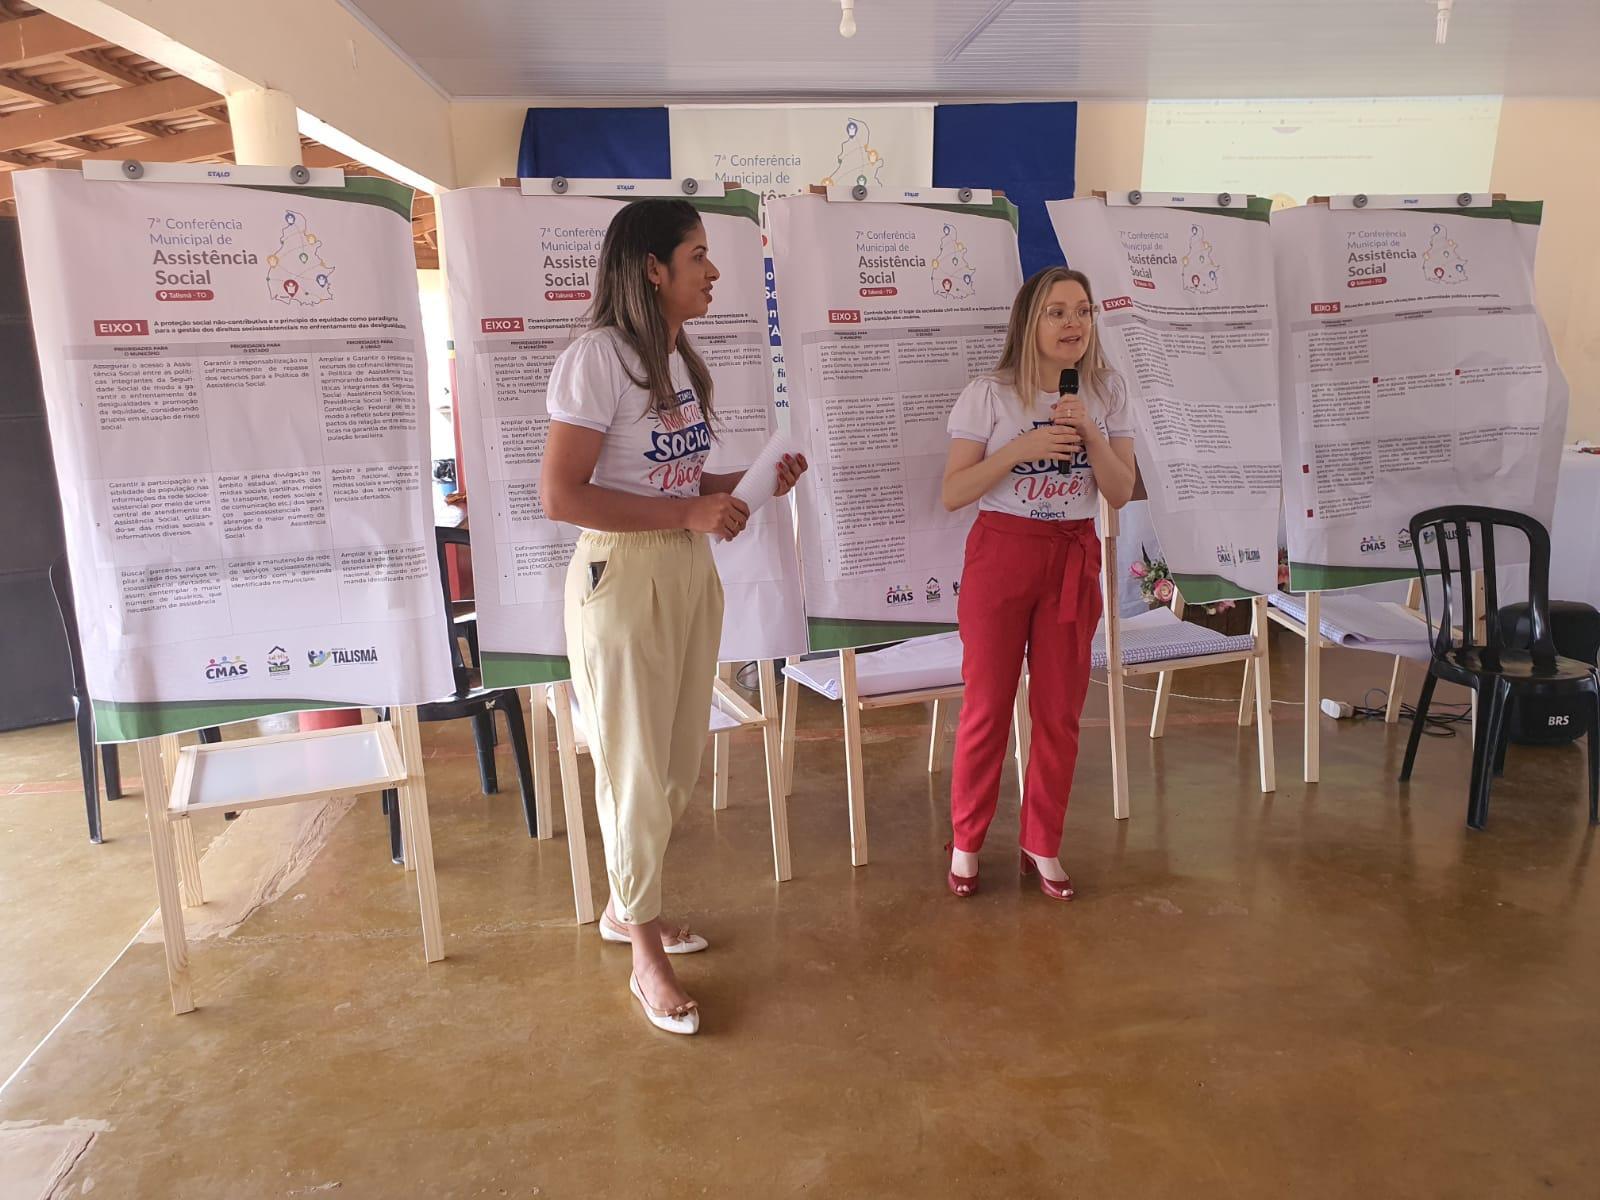 7° Conferência Municipal de Assistência Social